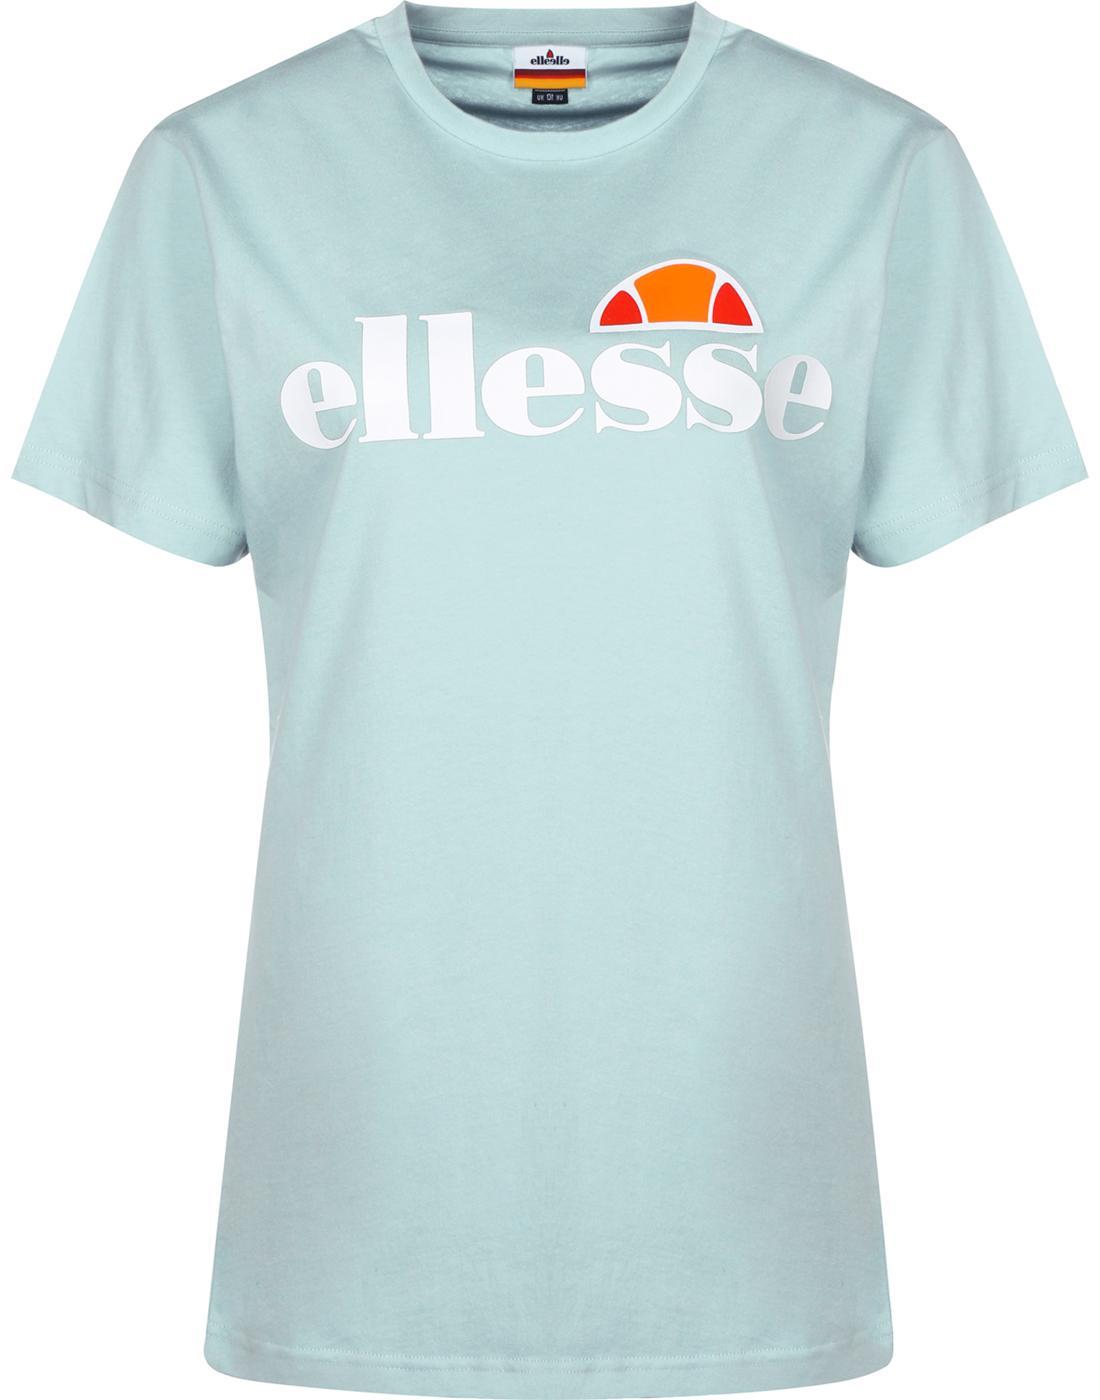 Albany ELLESSE Women's Retro 80s Boyfriend T-Shirt